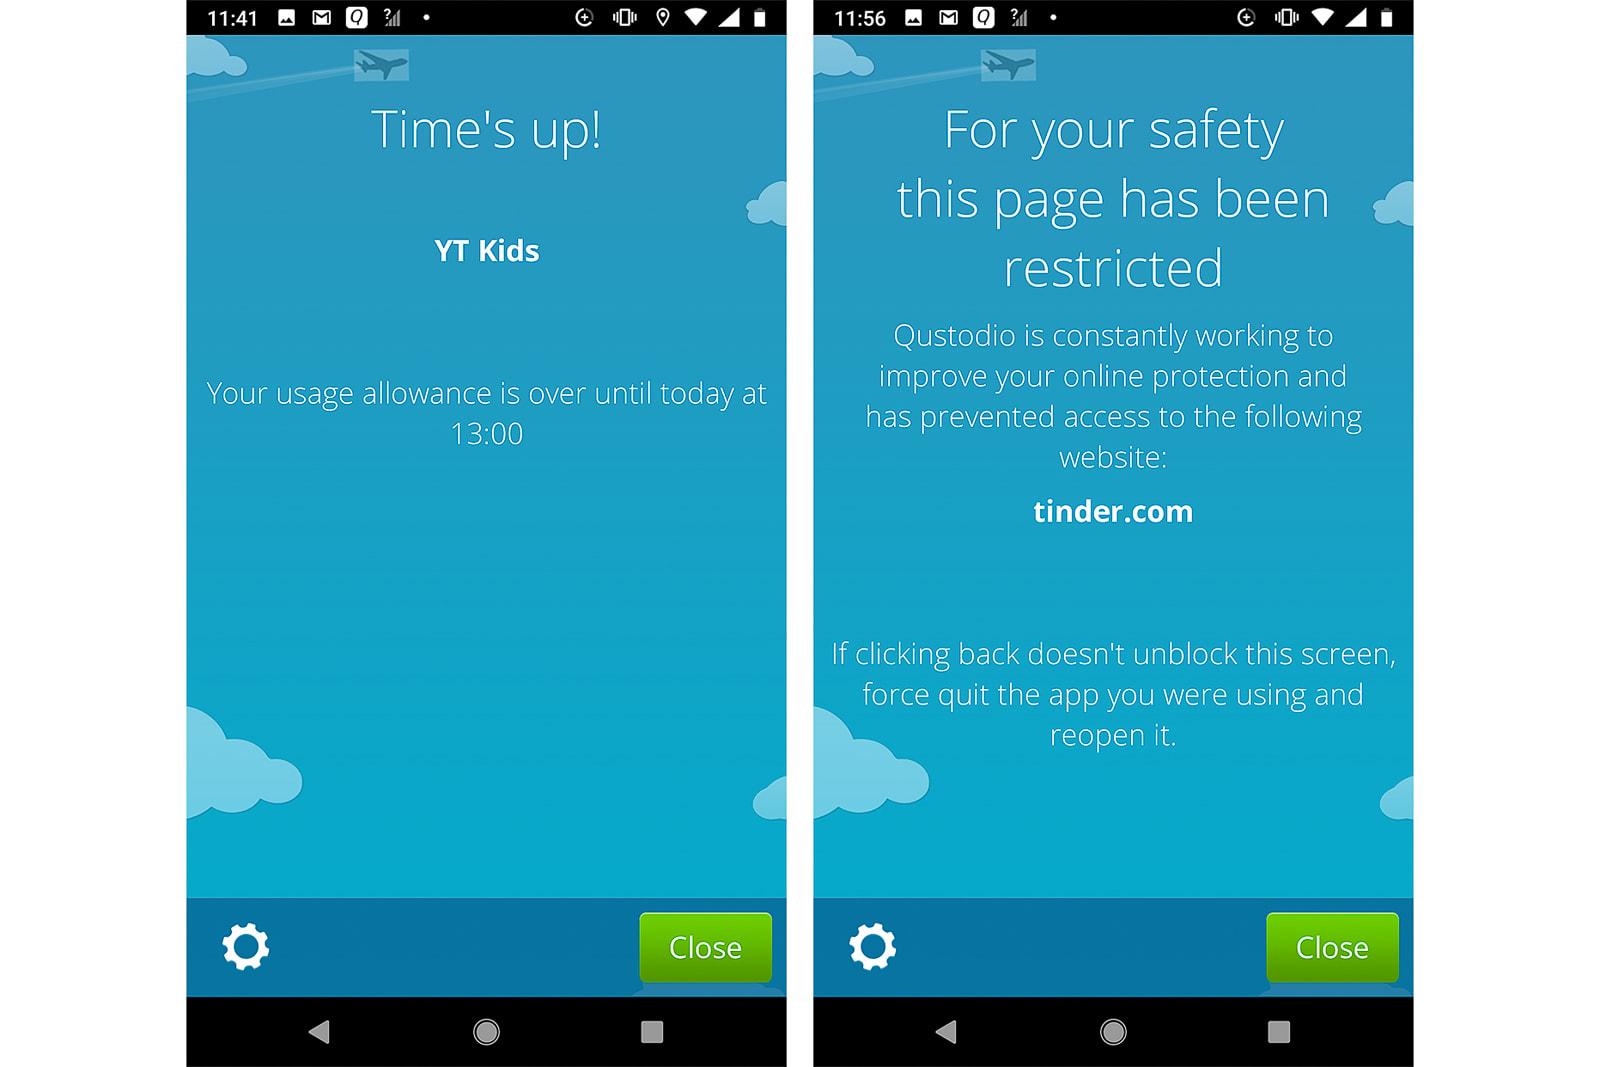 Apps for managing children's phones